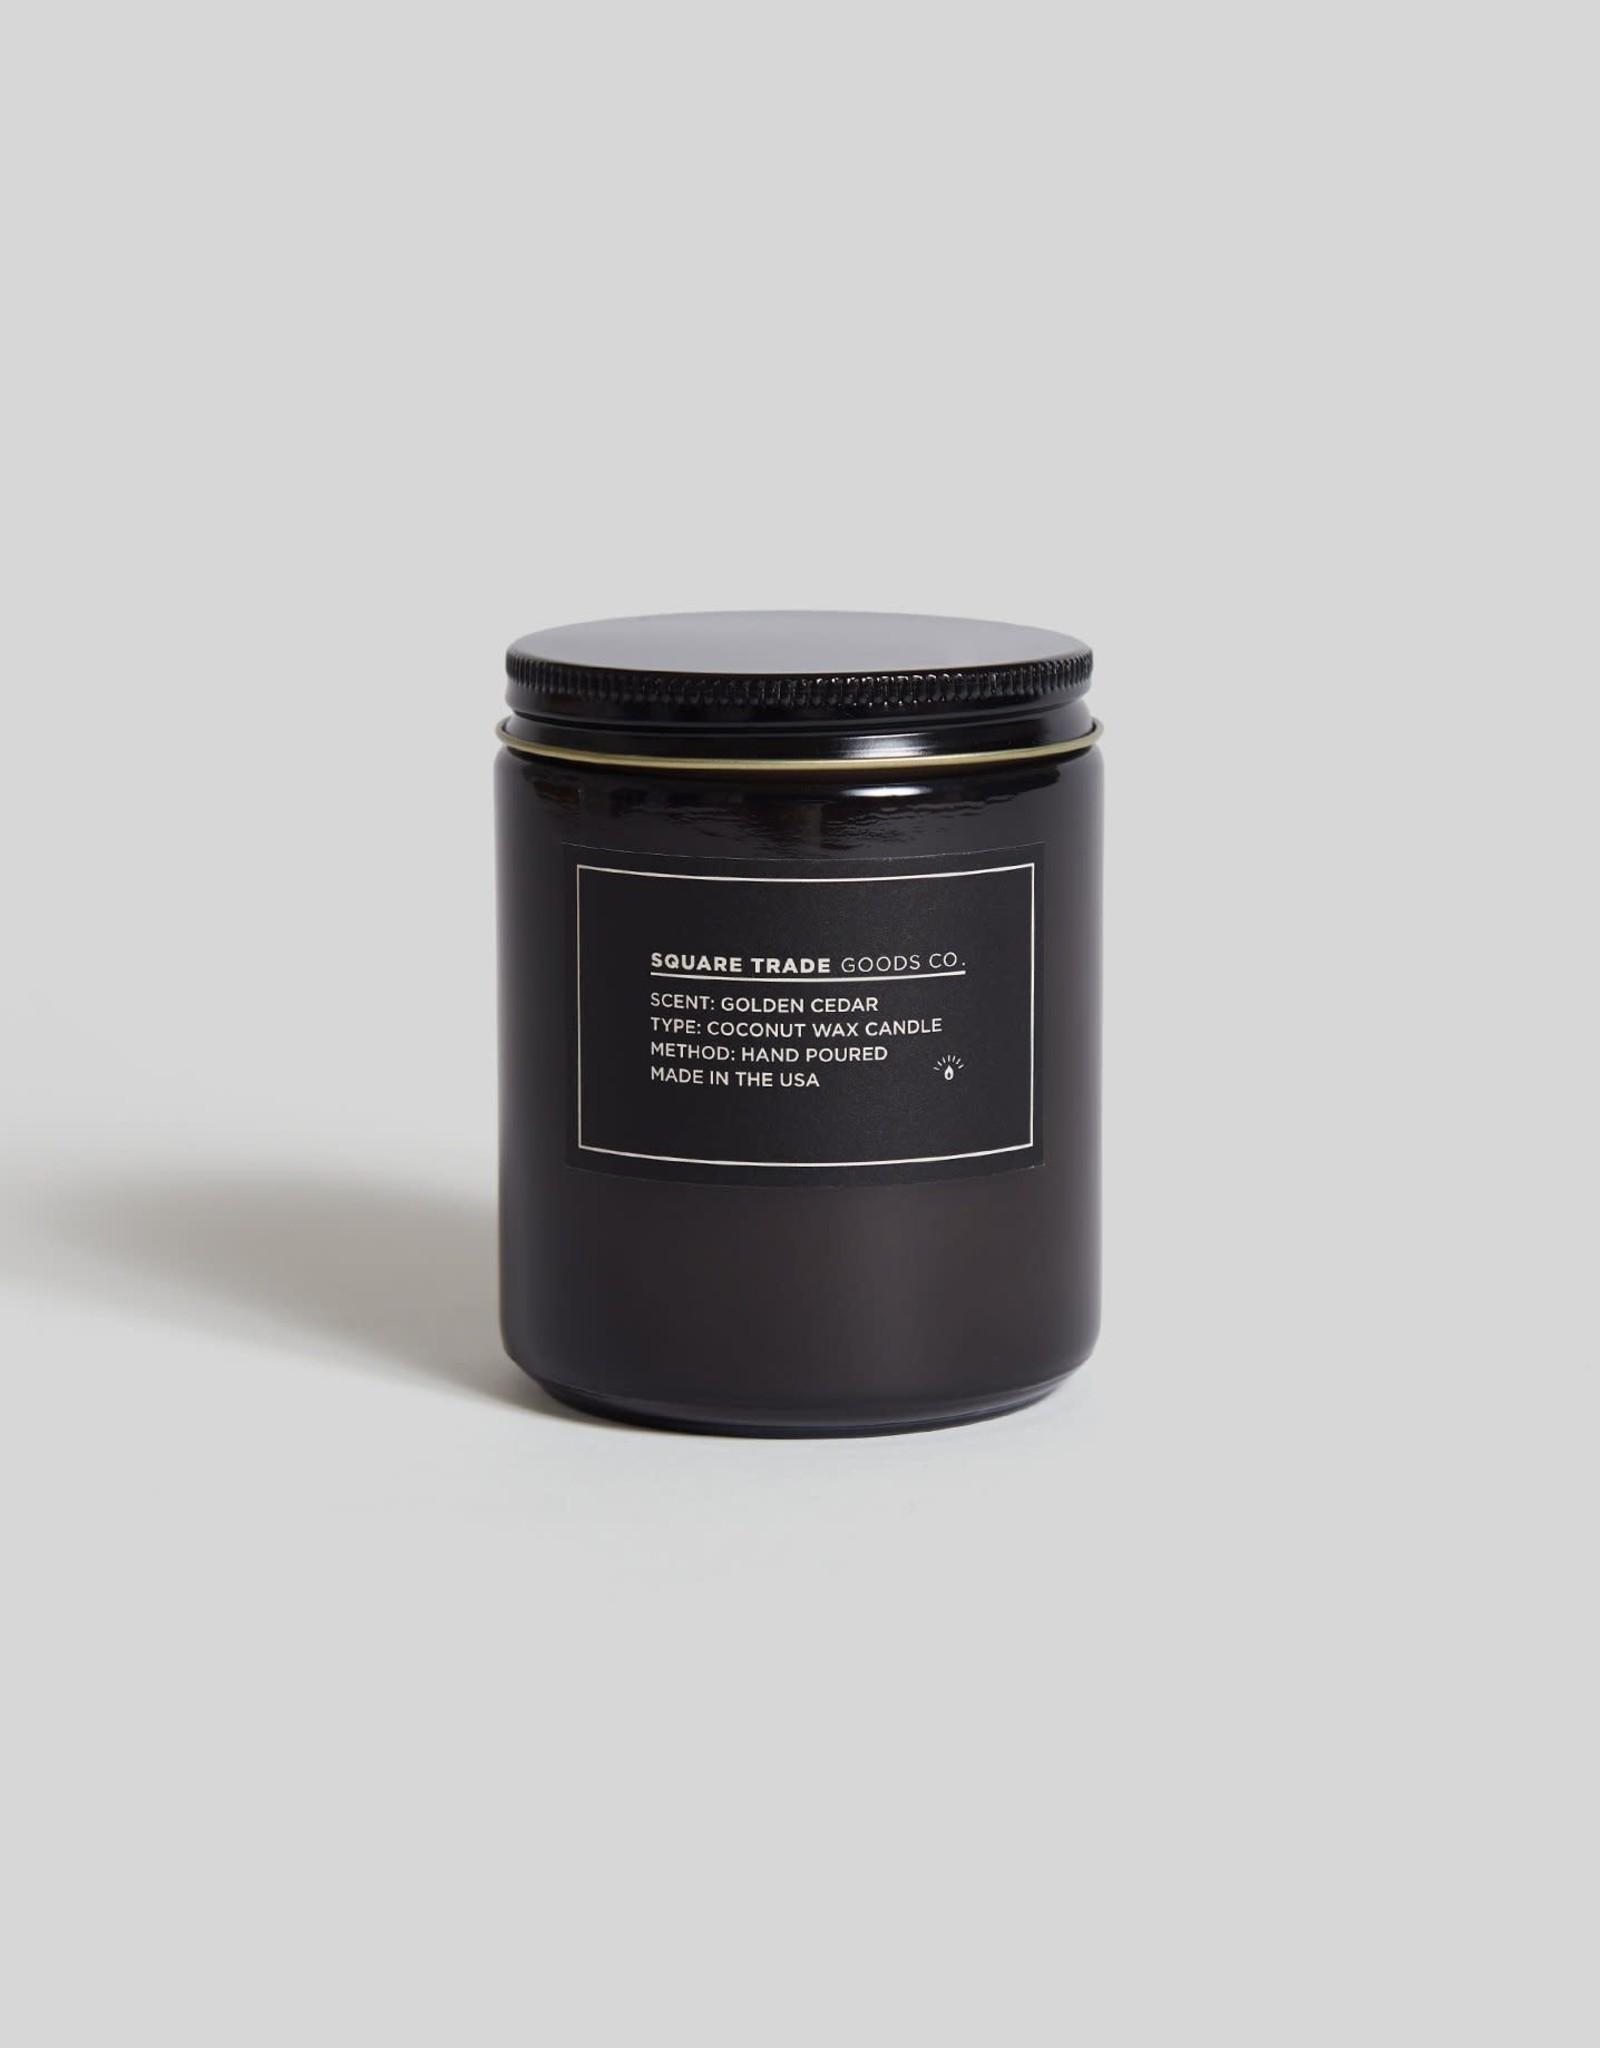 Square Trade Goods Co Golden Cedar Candle